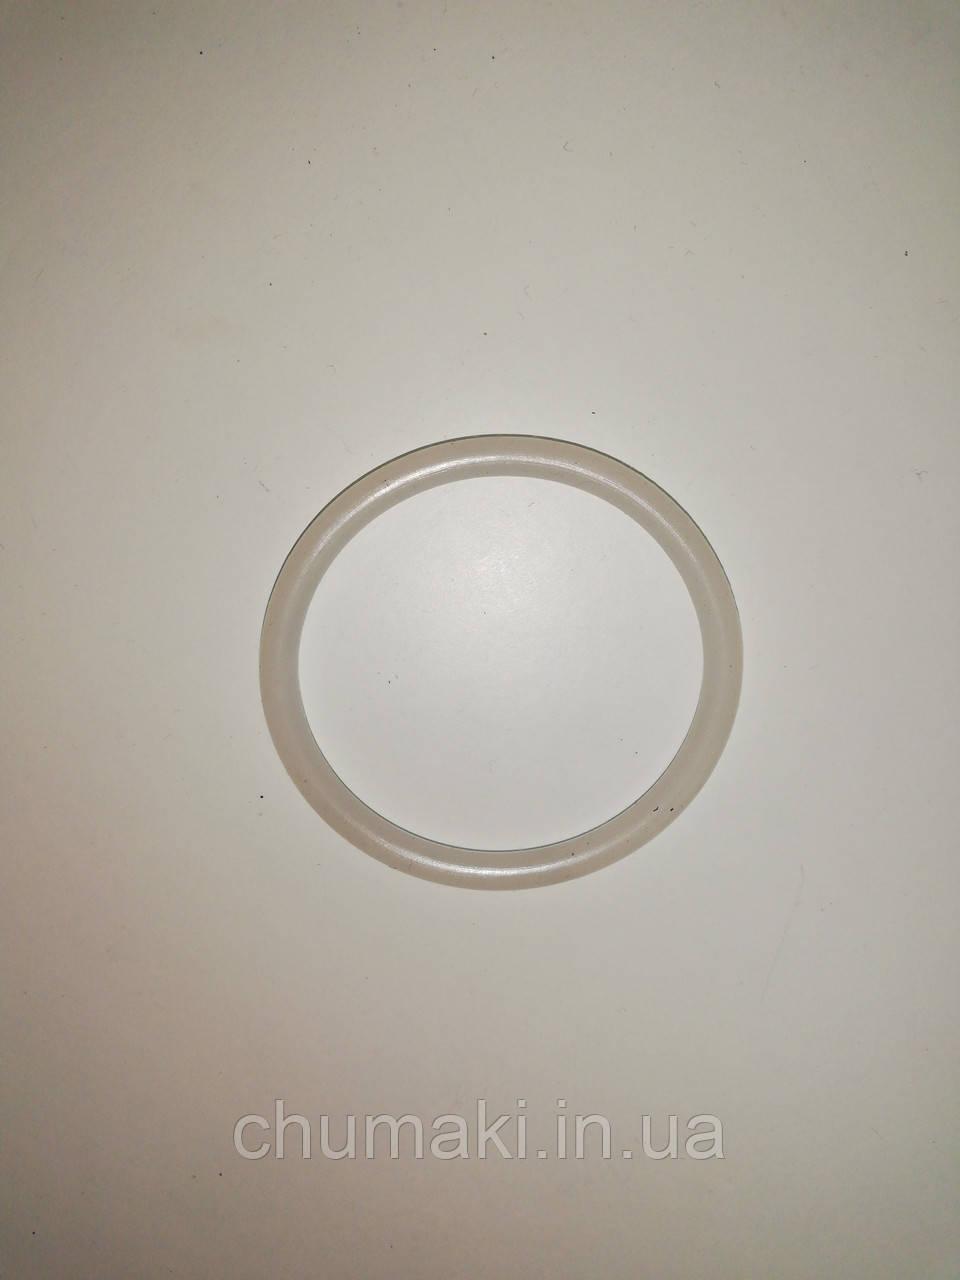 Кільце силіконове ущільнююче Кольцо силиконовое уплотнительное